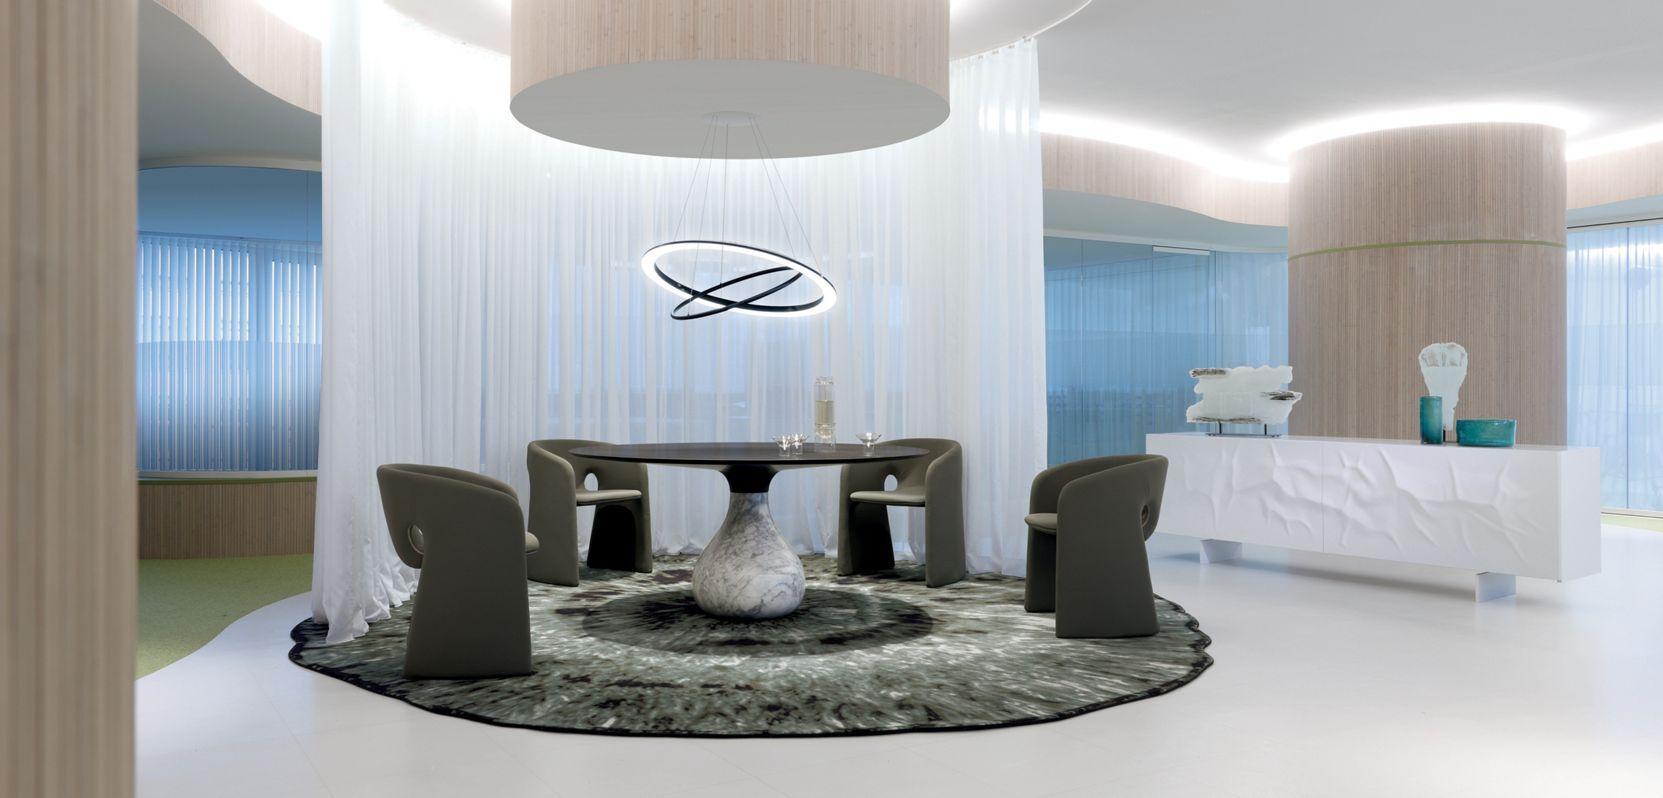 Roche Bobois Aqua Dining Table Designed By Fabrice Berrux  # Muebles Roche Bobois